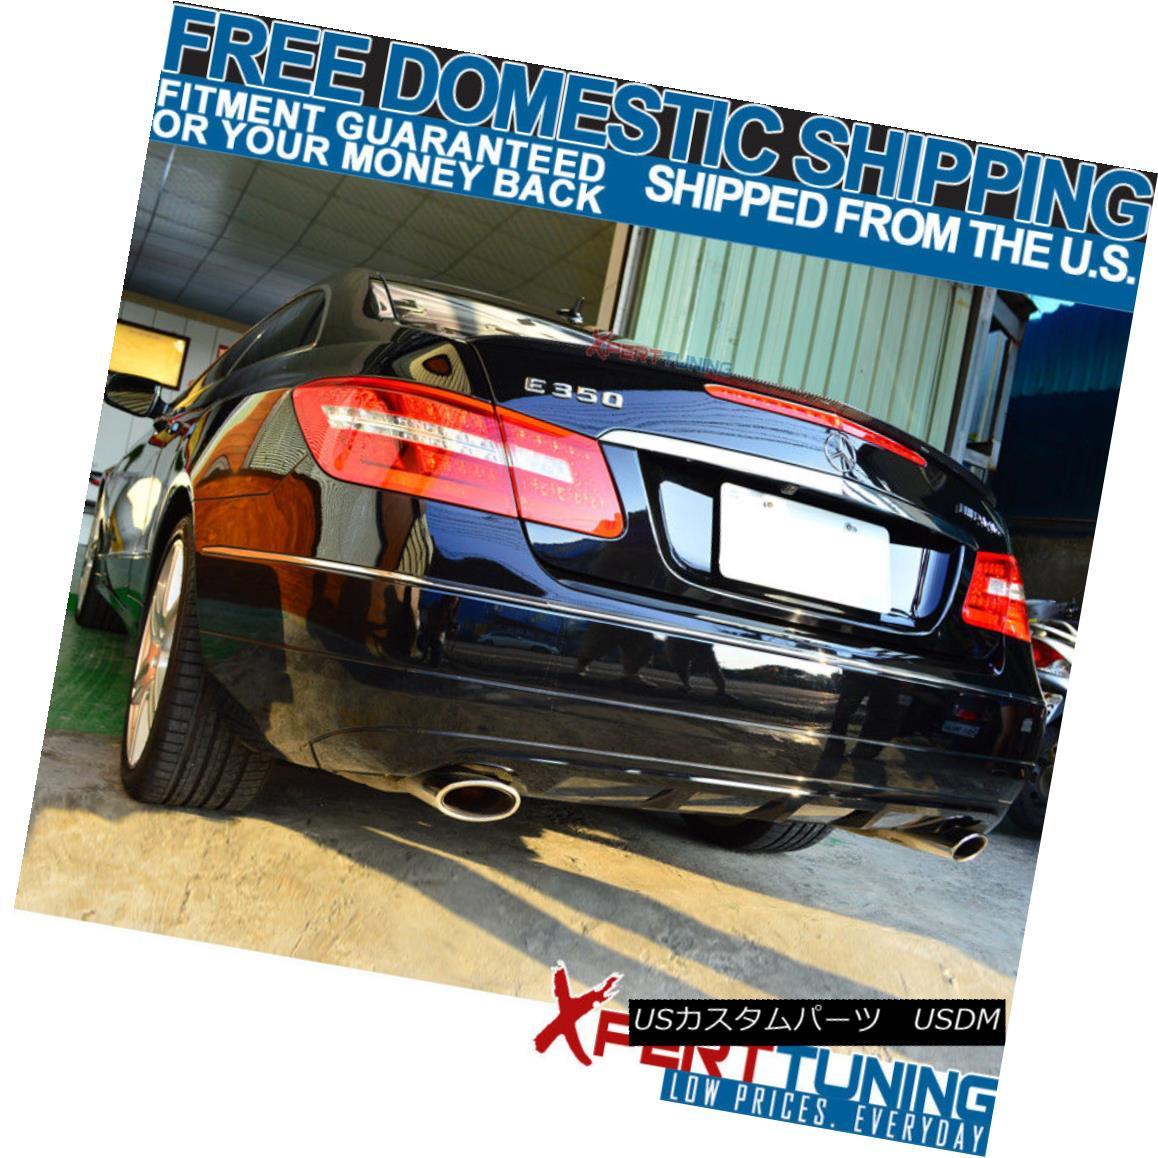 10-17 W207 C207 E-Class 2Dr 2Door Coupe CF Carbon Fiber AMG Style Trunk Spoiler